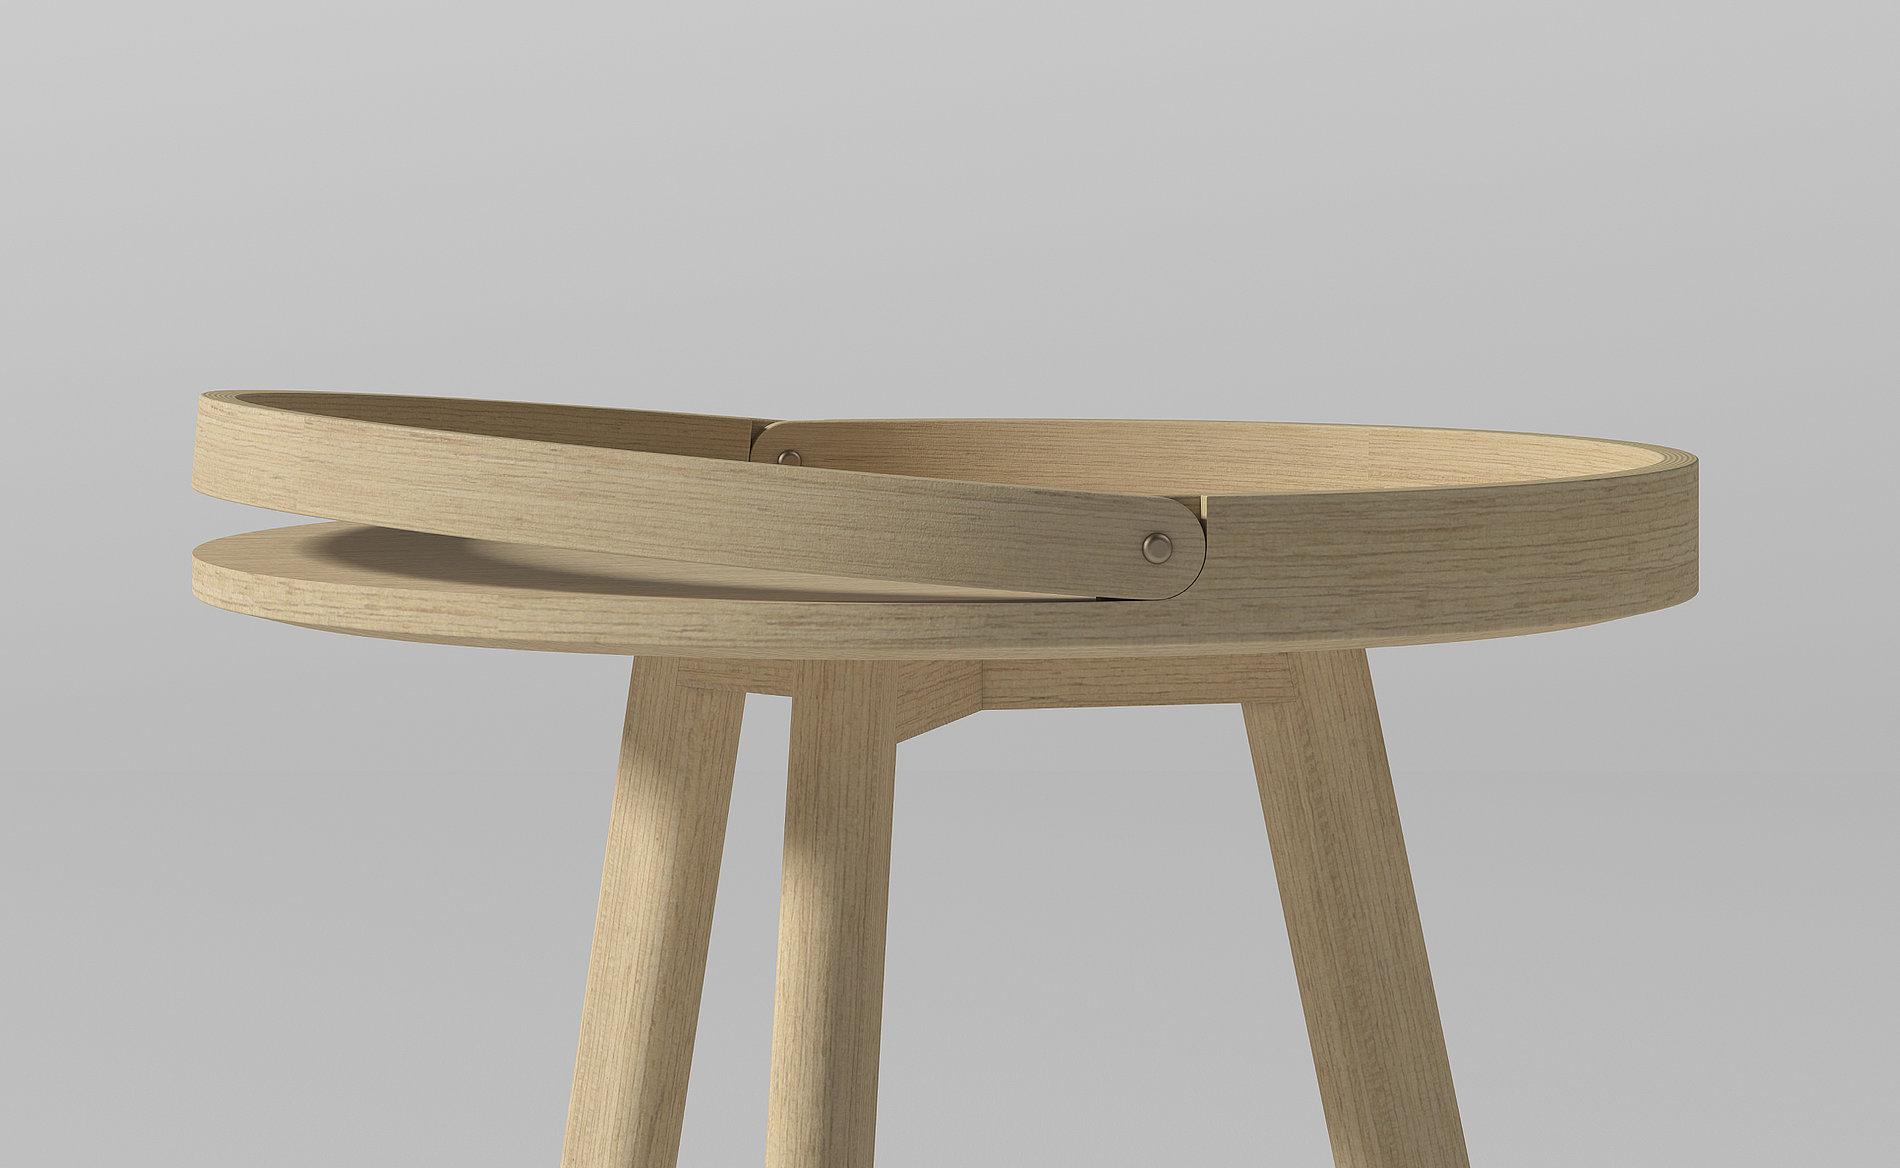 Tii Table | Red Dot Design Award